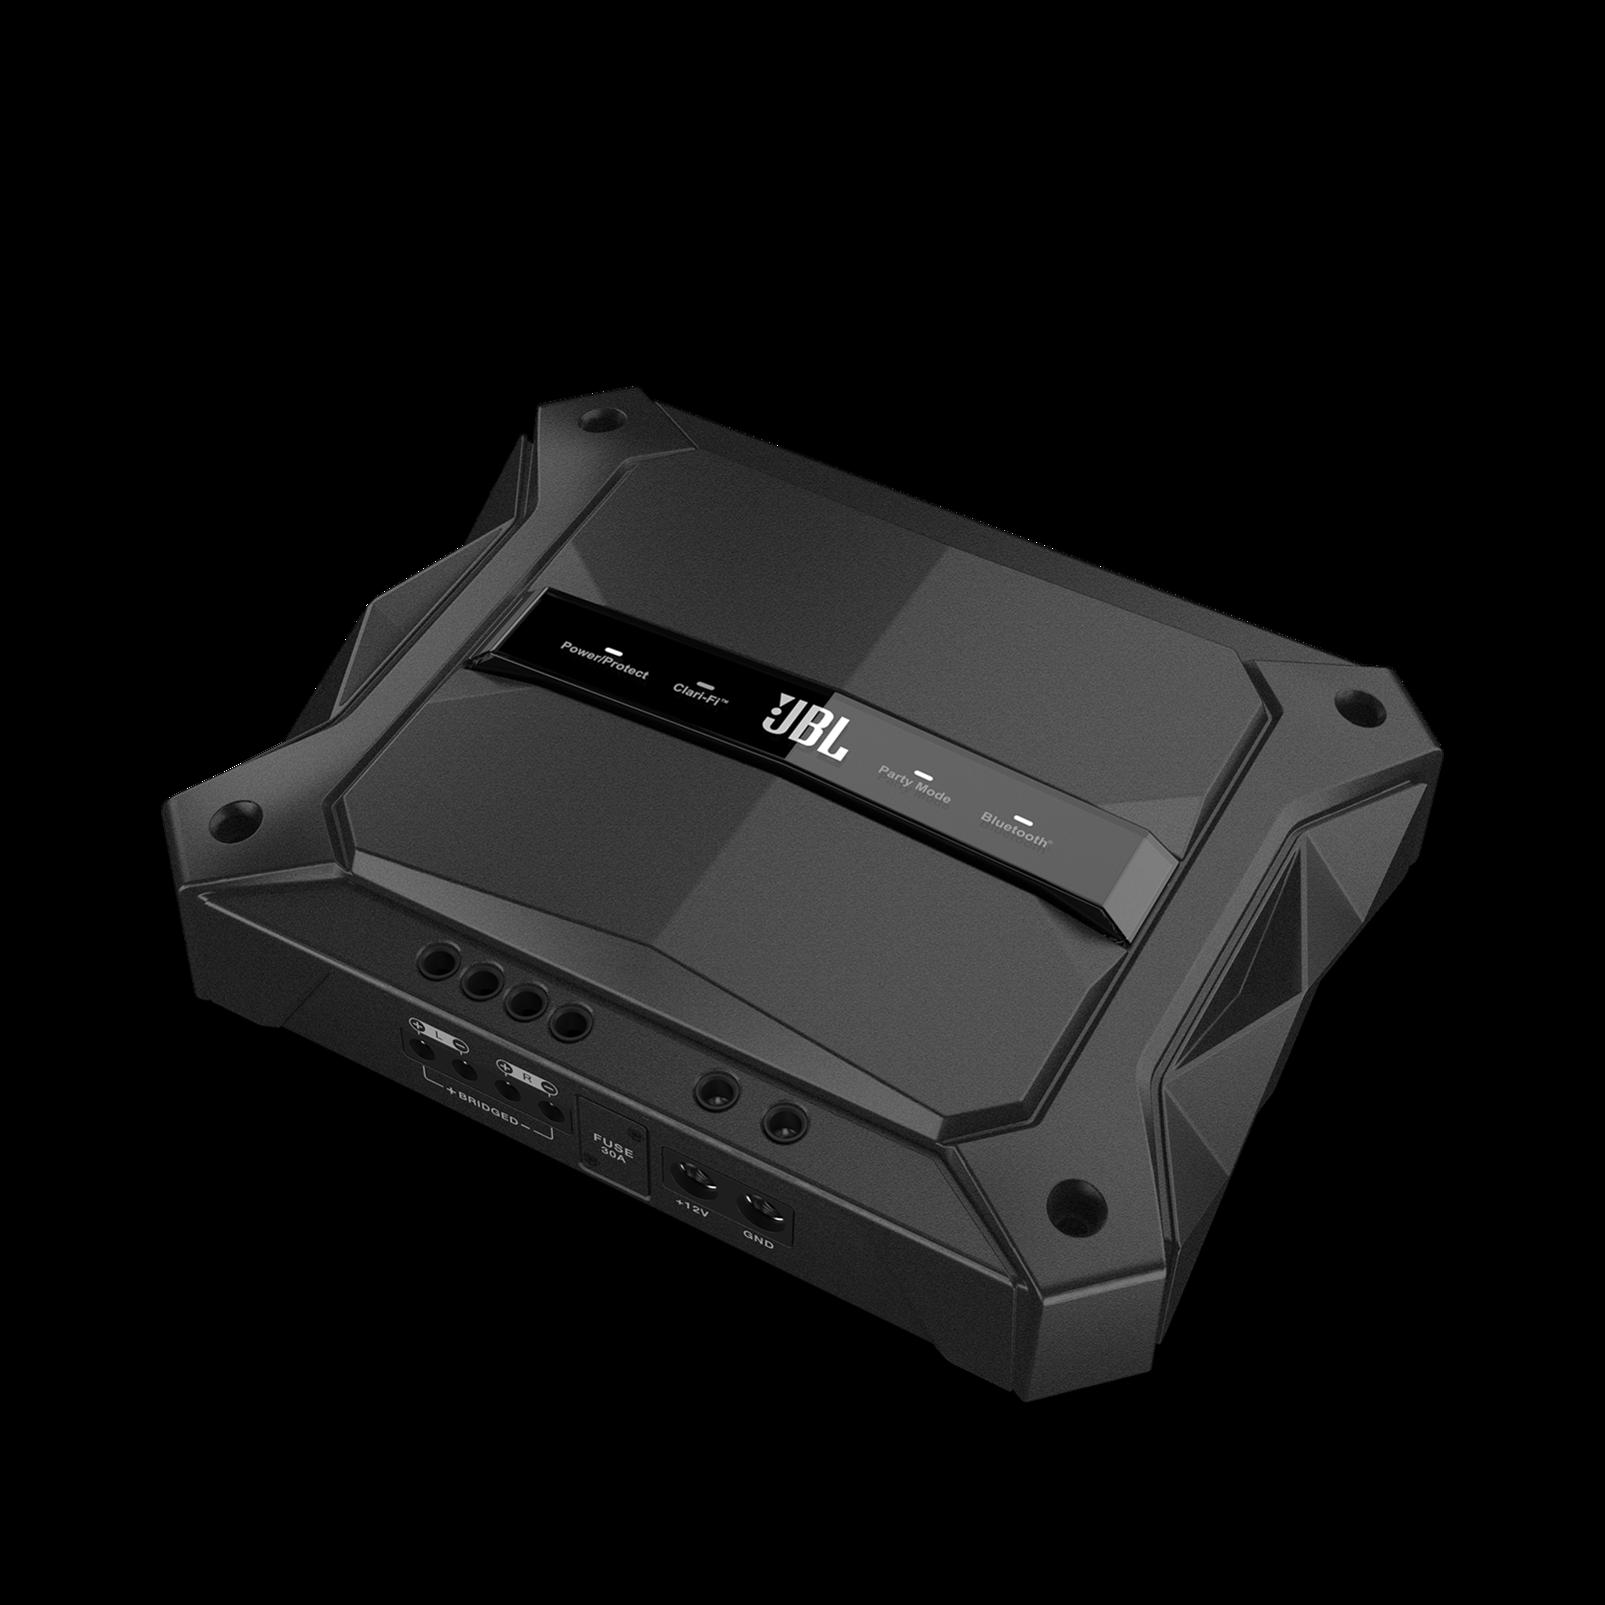 GTR-102 - Black - 2 Channel, 700W High Performance Car Amplifier - Hero